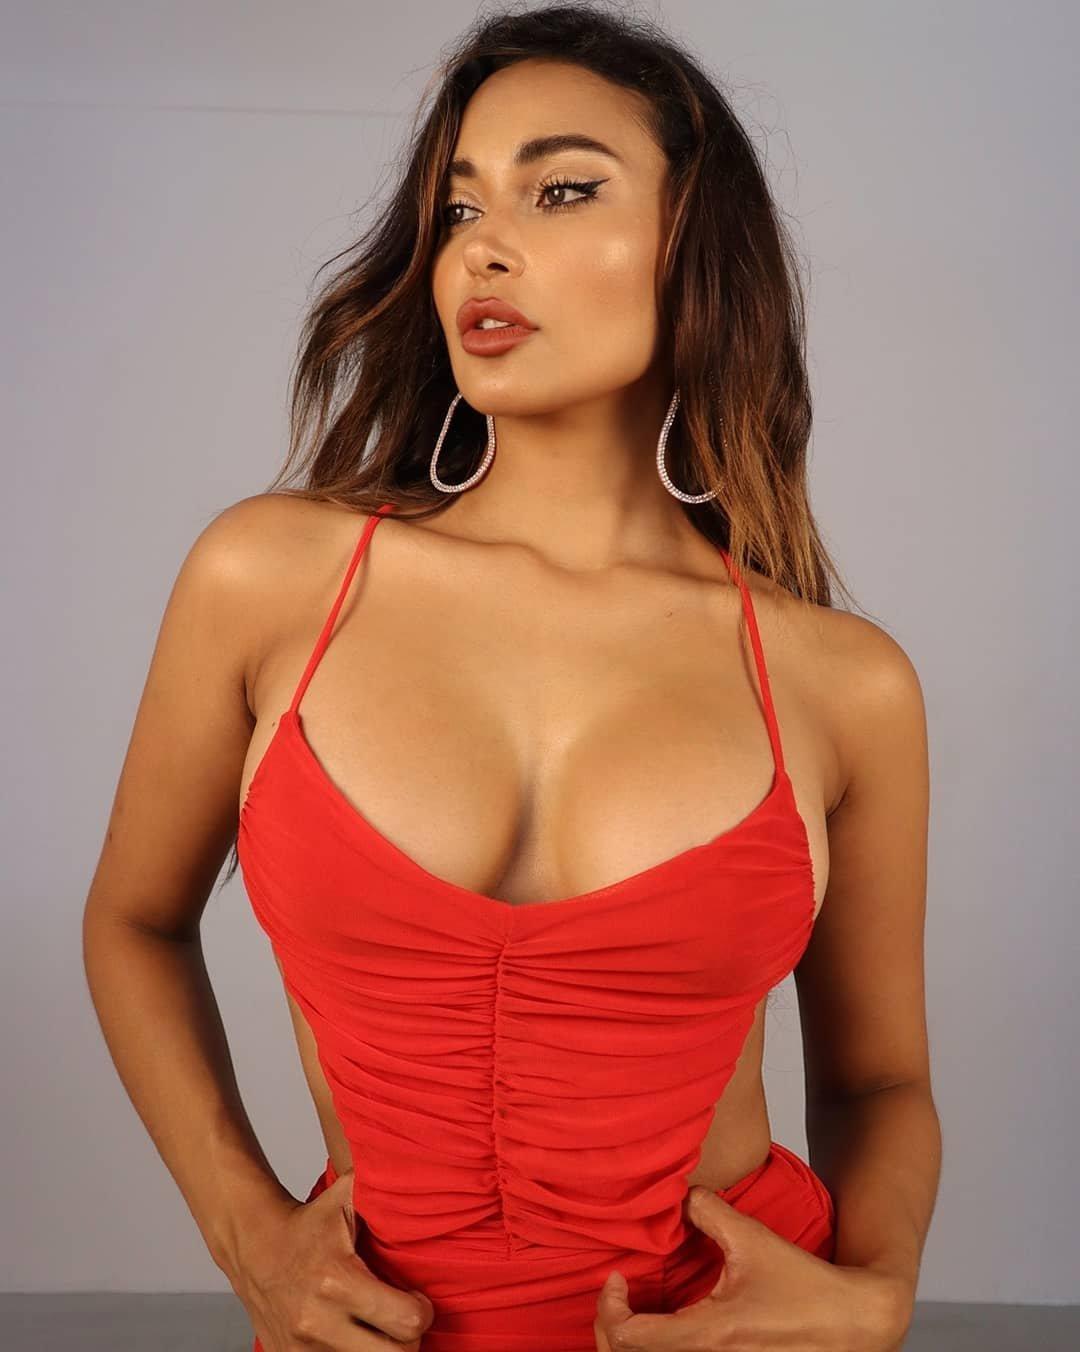 Марона Таннер грудь, фото